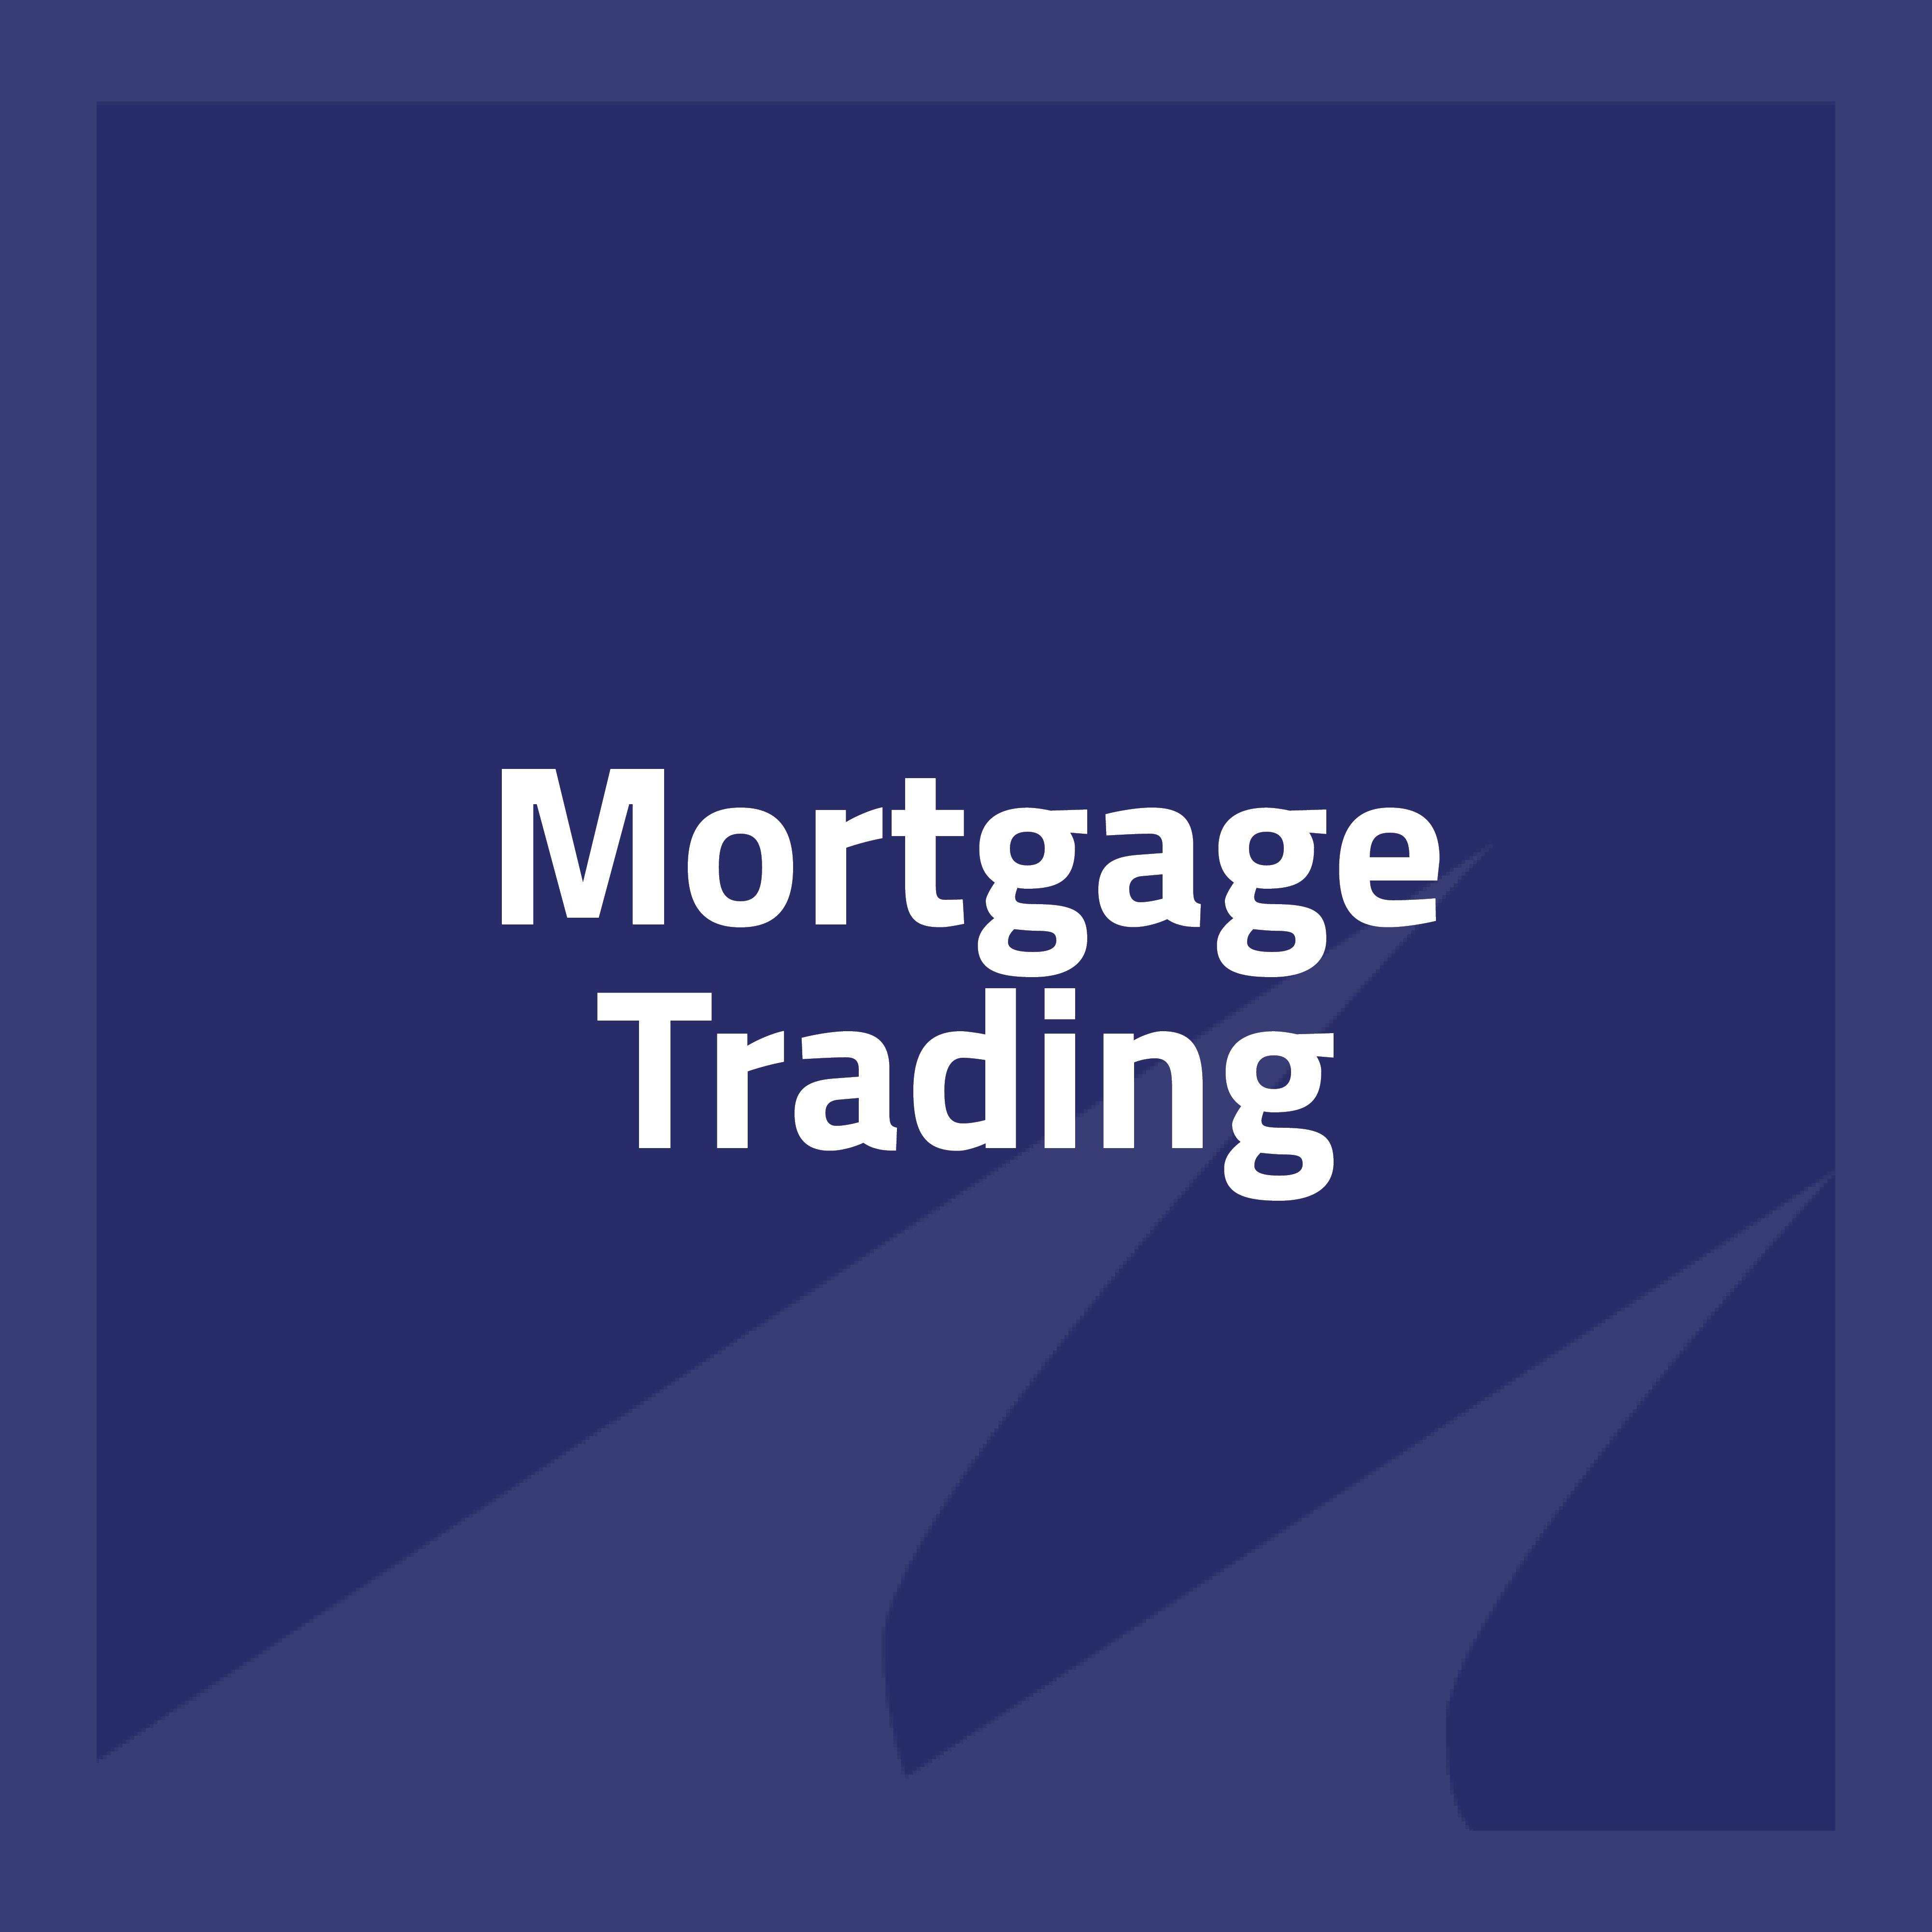 MortgageTrading